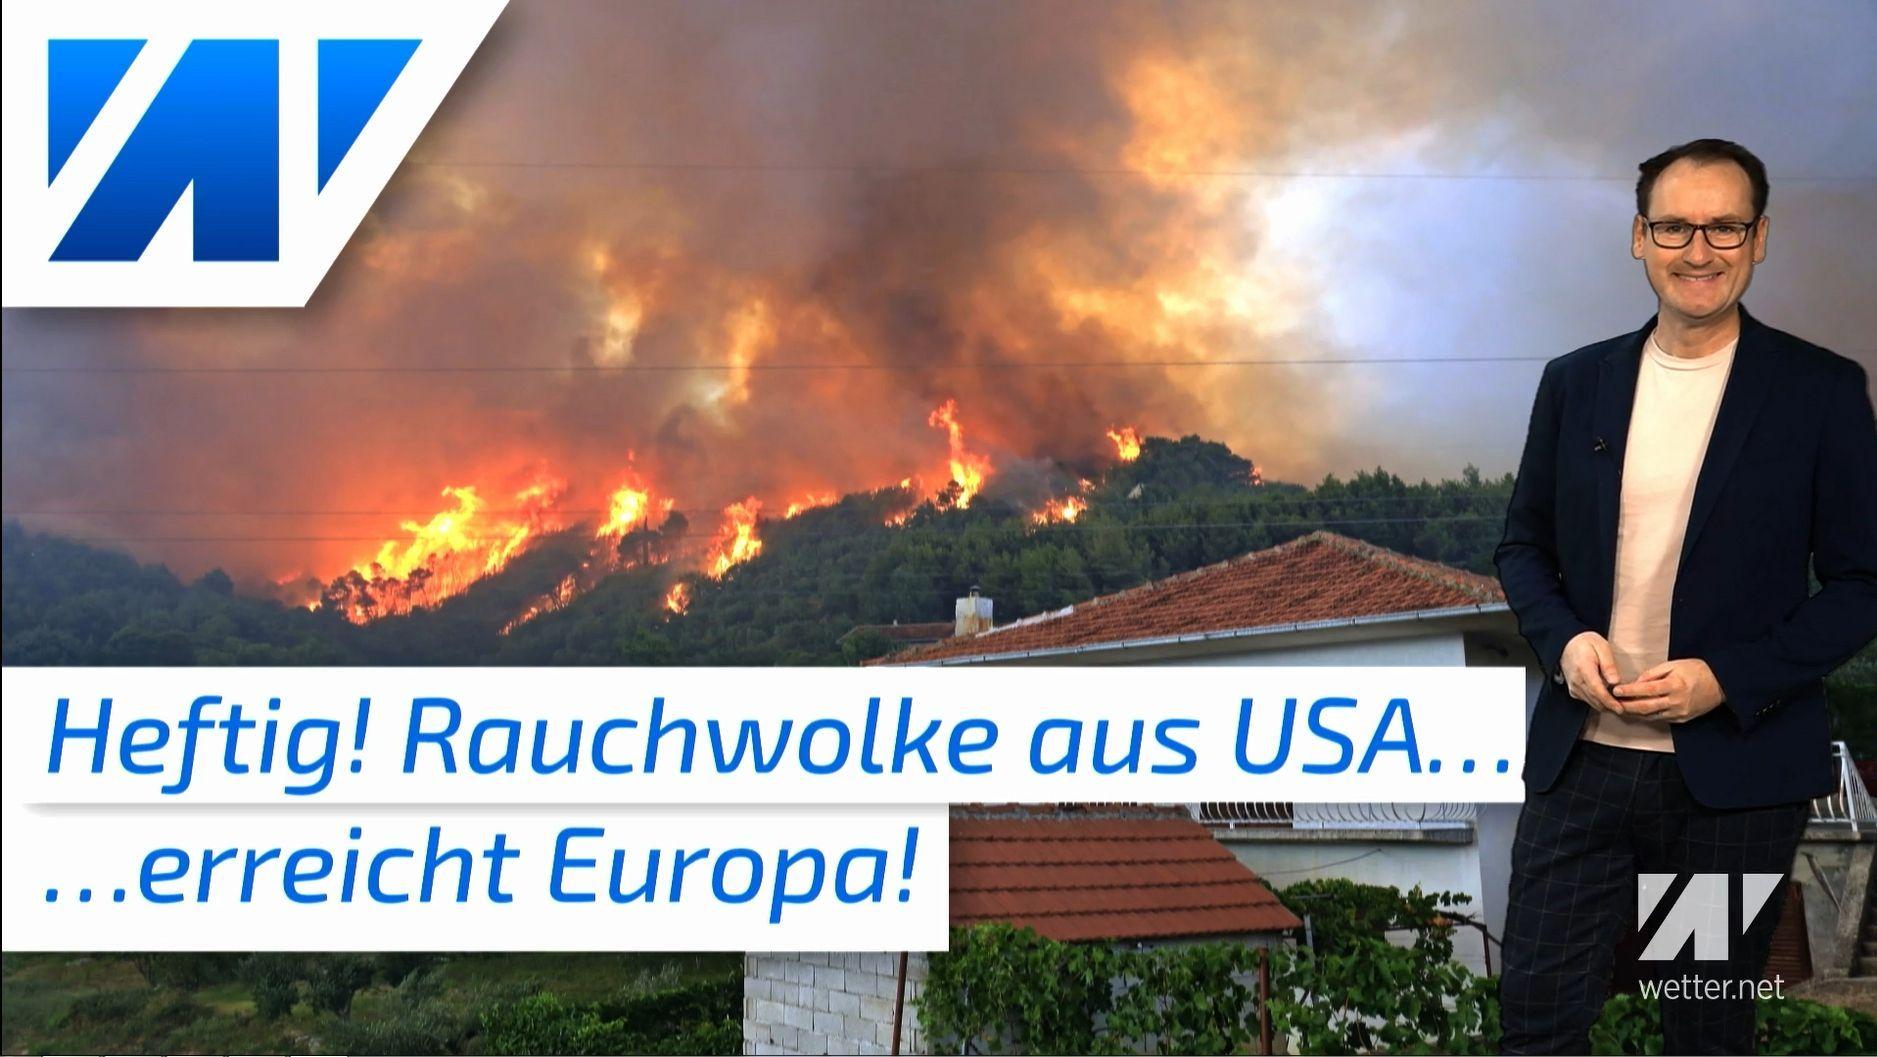 Gruselig: US-Waldbrände verdunkeln Europas Himmel